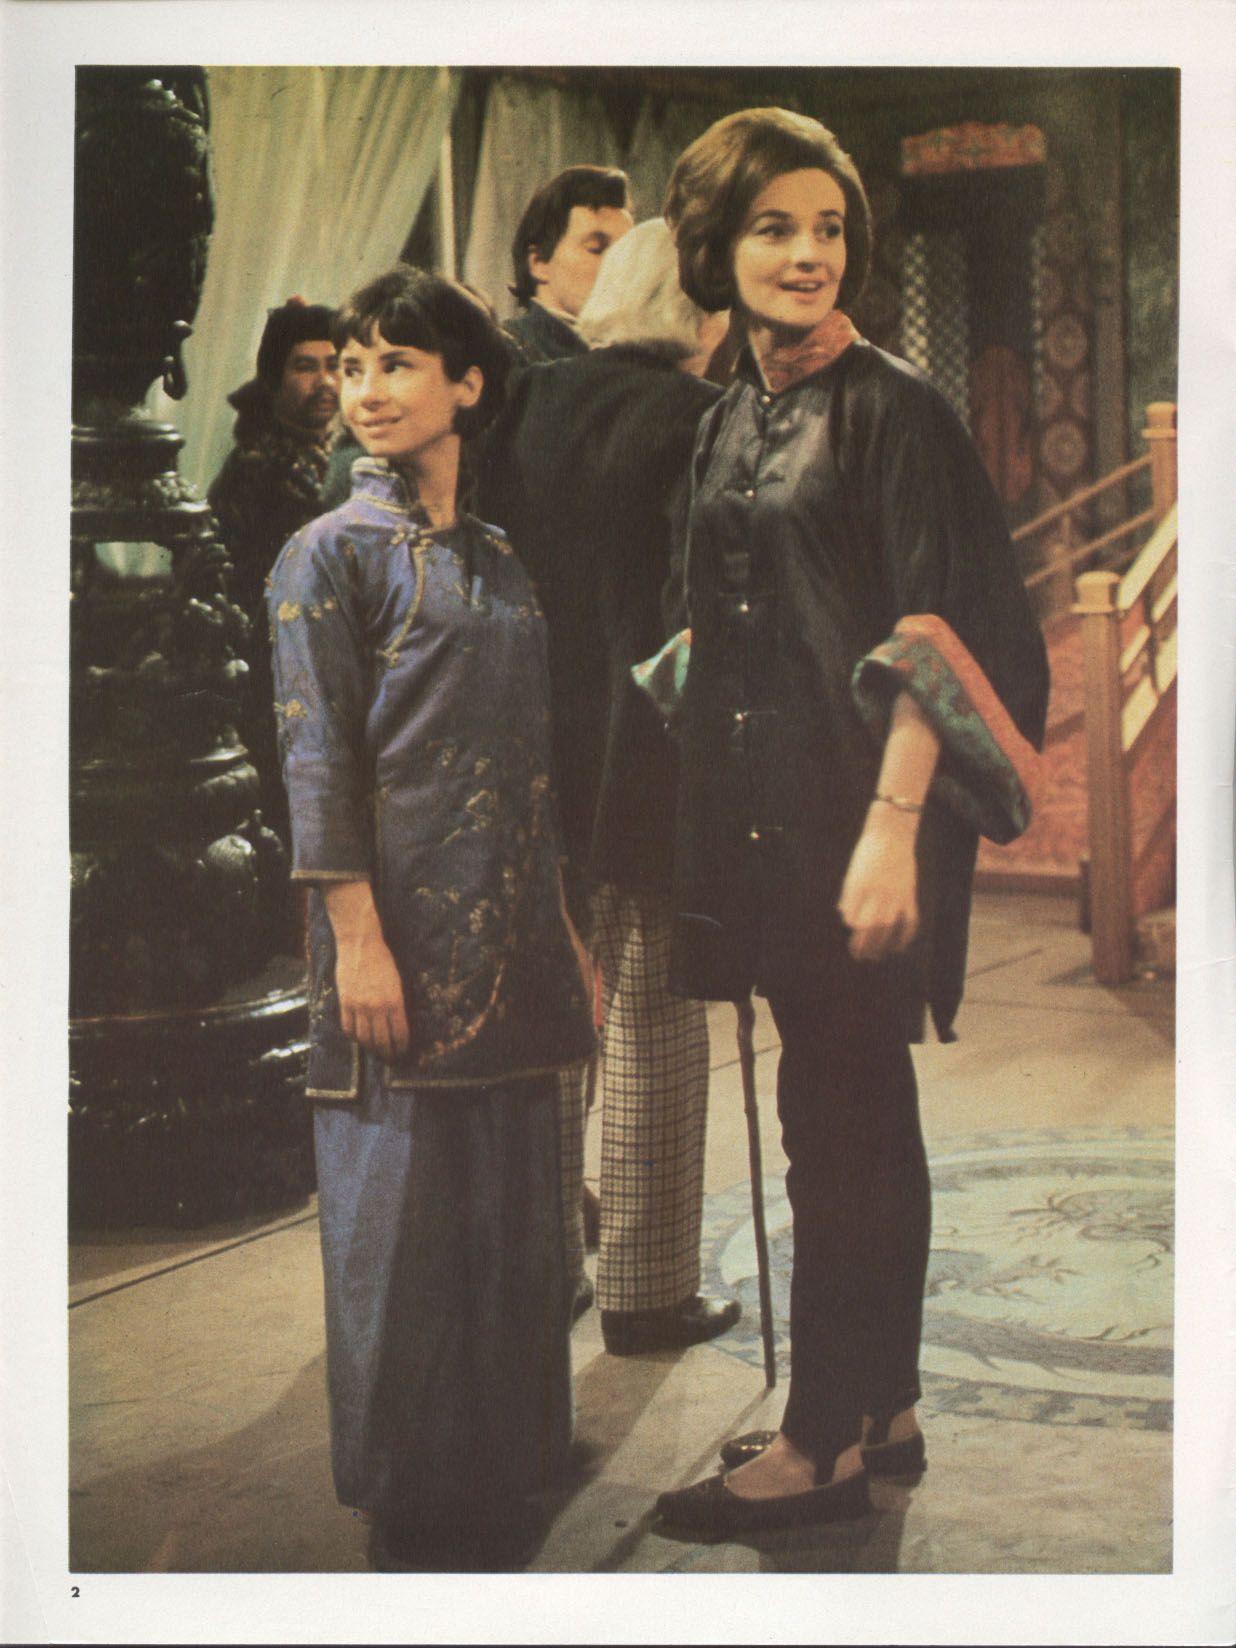 Carole ann ford and jacquelinehill carolannford doctorwho companions